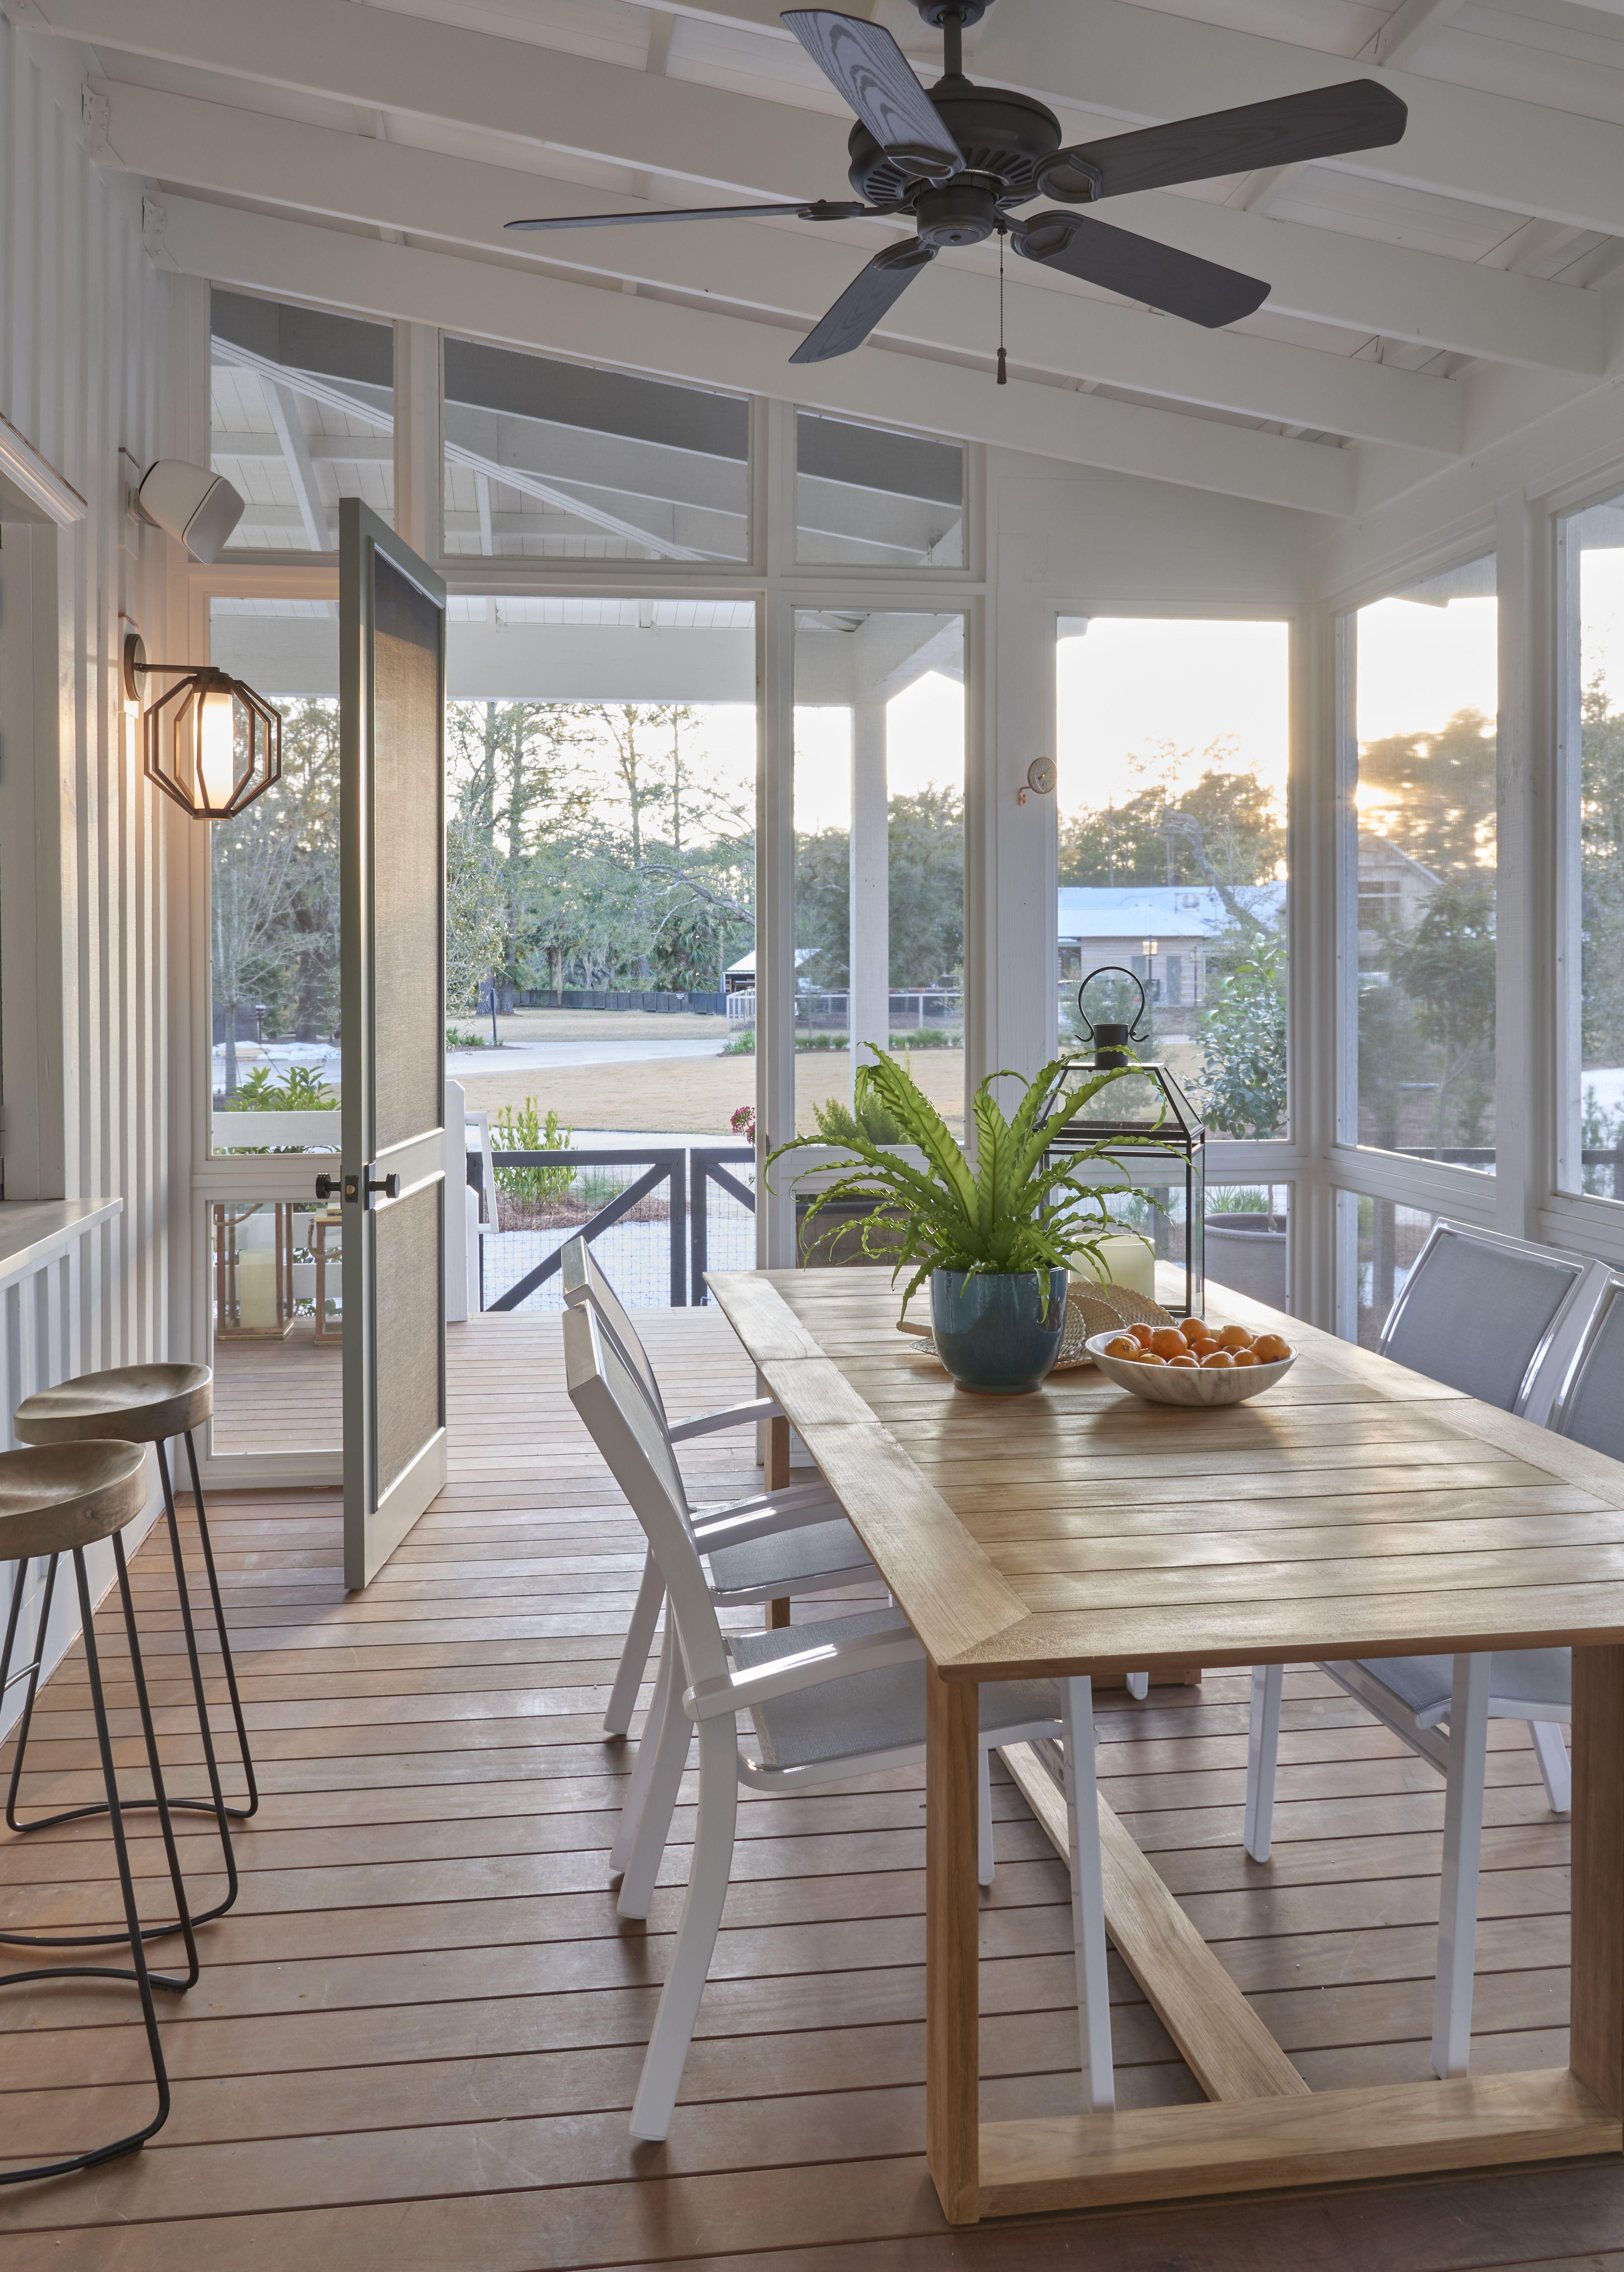 Artist Cottage With Modern Farmhouse Vibes Asks $13M  Curbedclockmenumore Arrownoyesconcert